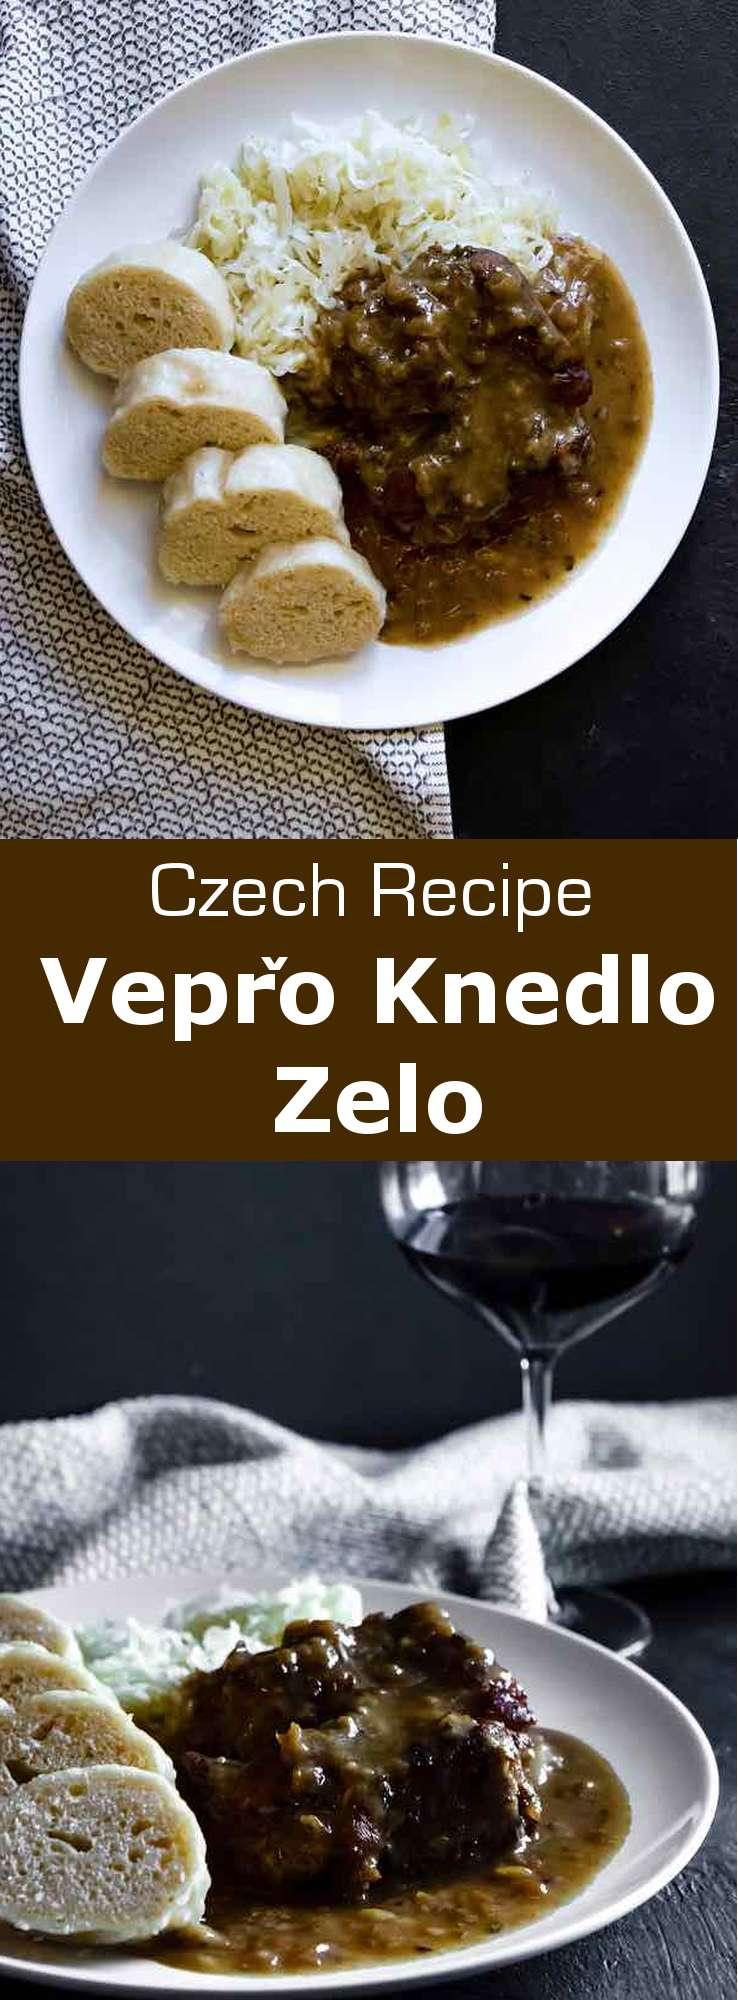 Vepřo knedlo zelo, short for roast pork (vepřová), bread dumplings (knedlíky) and sauerkraut (zelí) is one of the most classic and traditional Czech dishes. #CzechRepublic #CzechCuisine #CzechRecipe #CzechRoast #CzechDumpling #Sauerkraut #WorldCuisine #196flavors